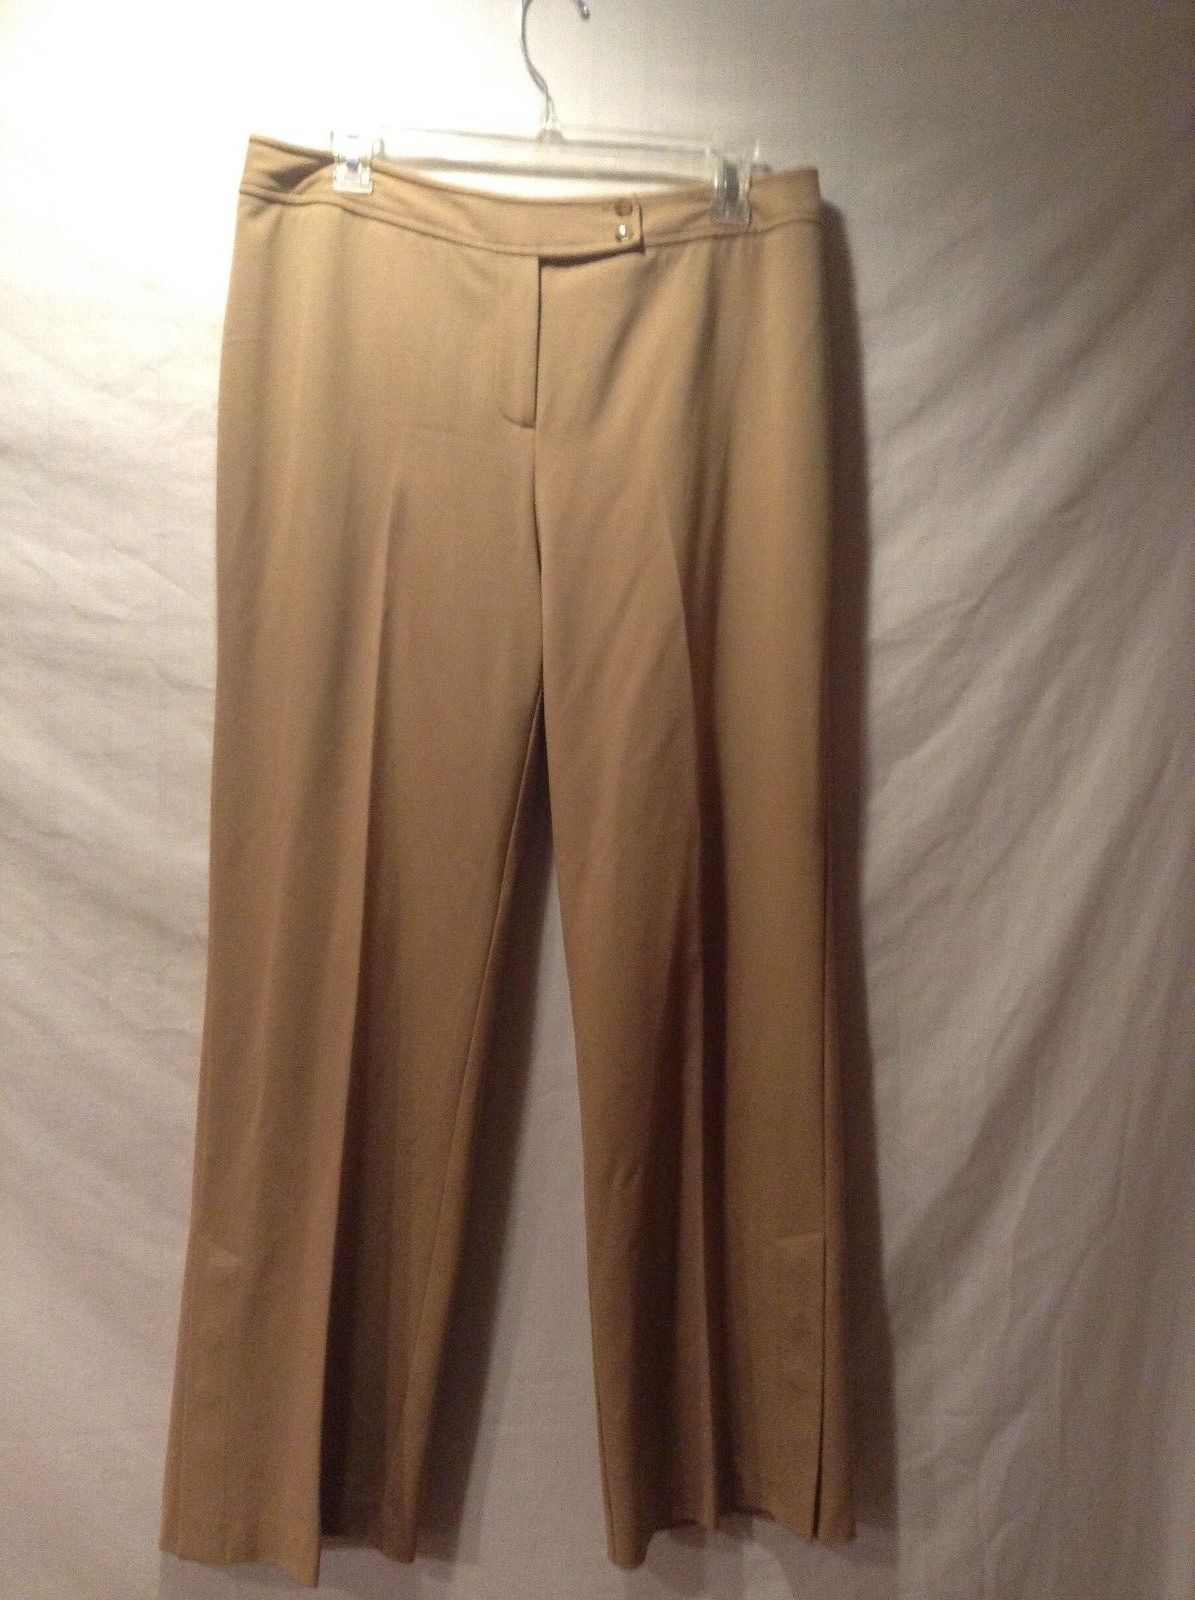 Bandolino Ladies Petite Biege Stretchy Dress Pants Size 12P